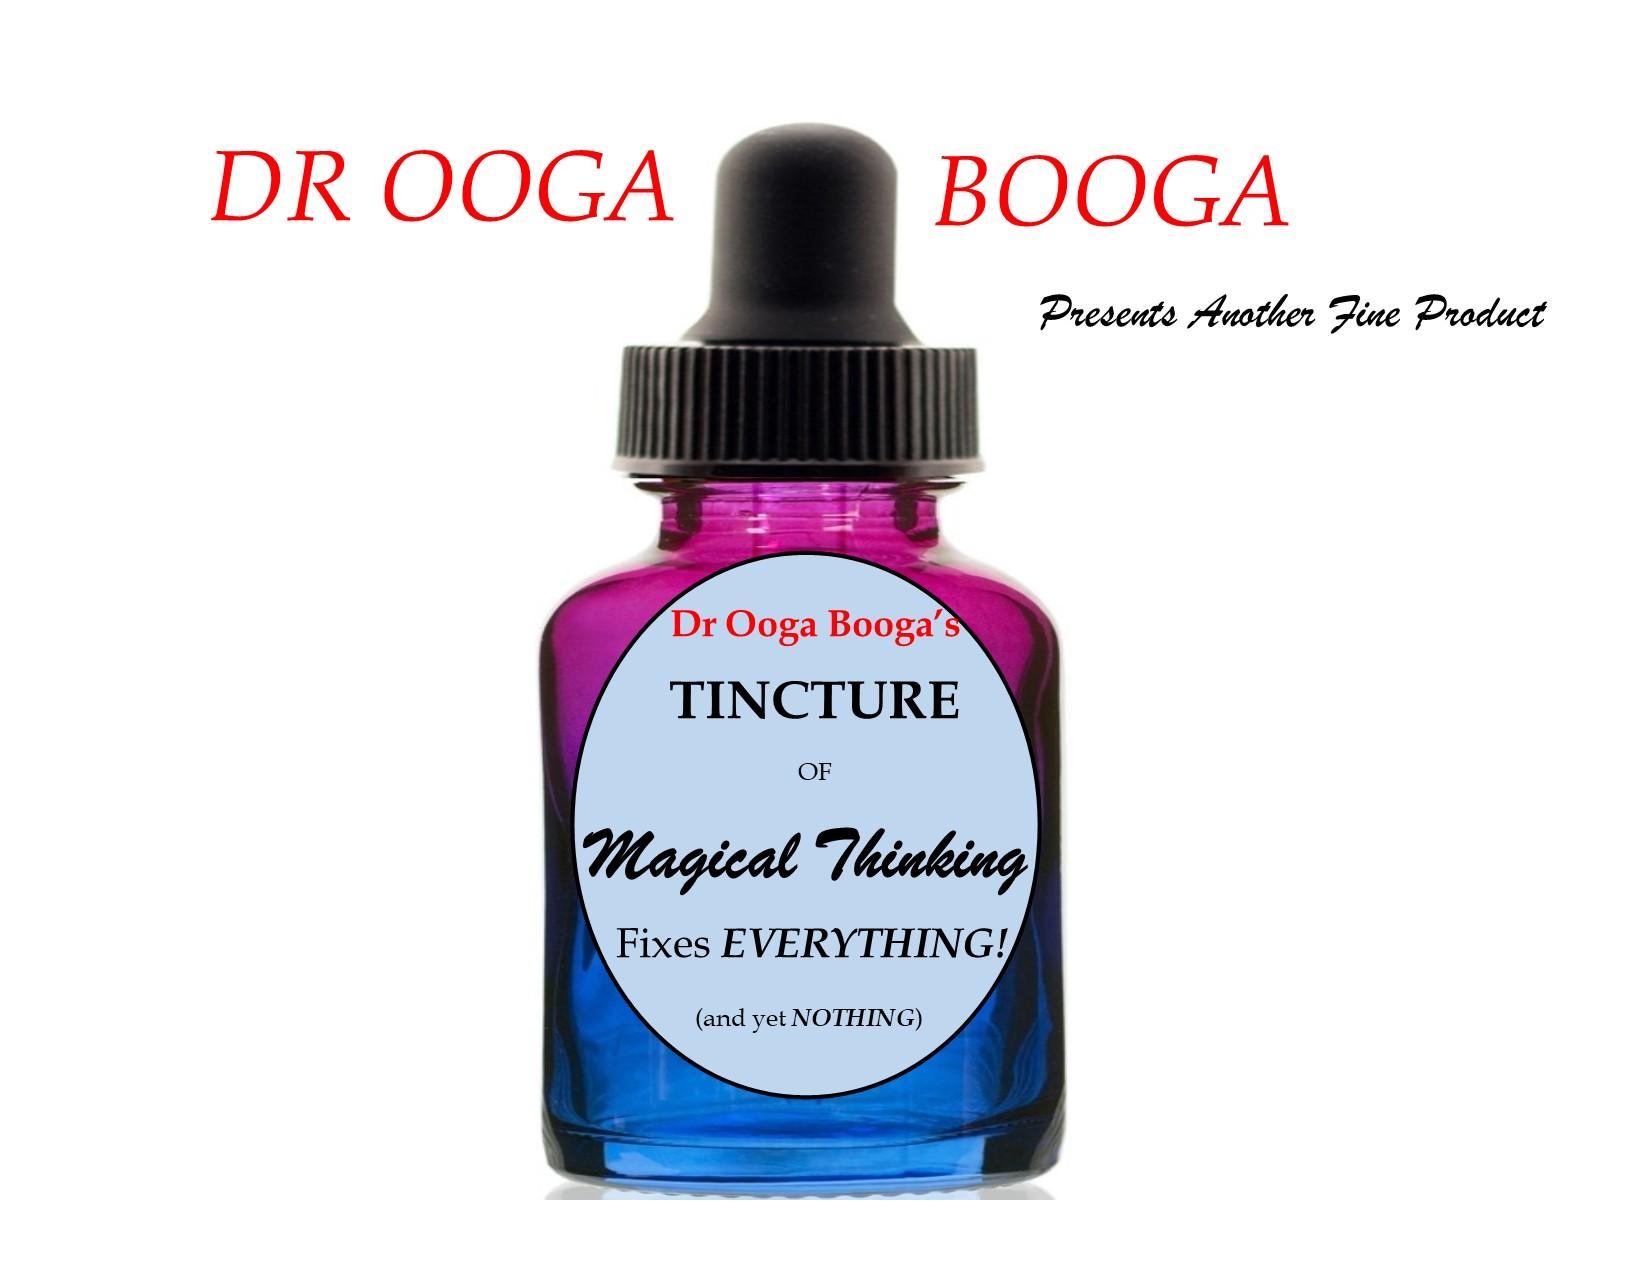 Dr Ooga Booga's Tincture Bottle